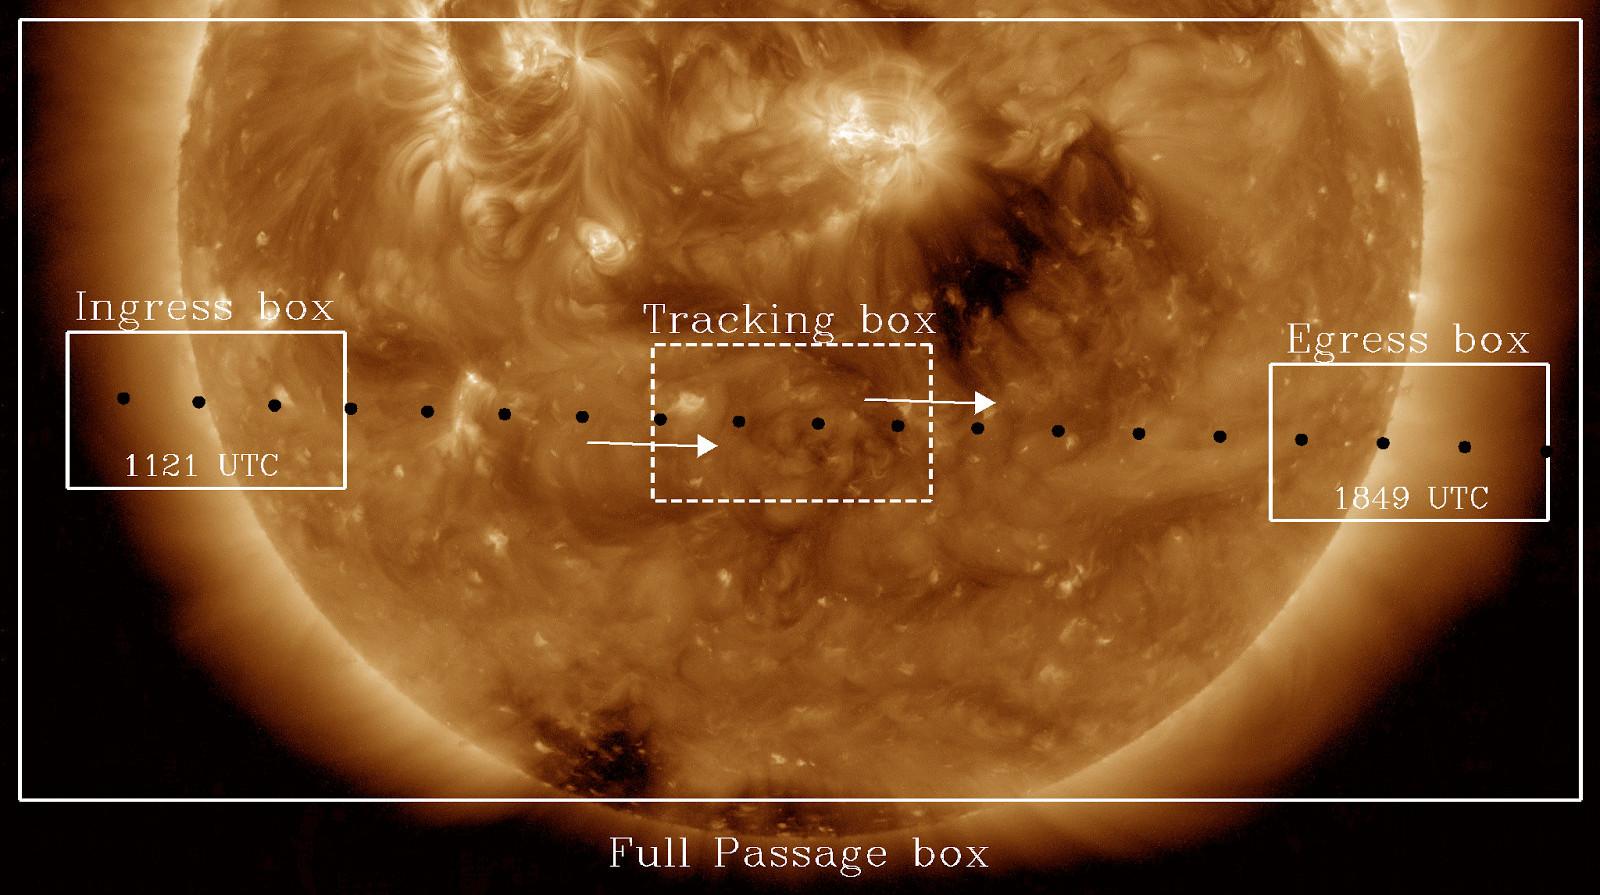 Image credit: NASA's Solar Dynamics Observatory.